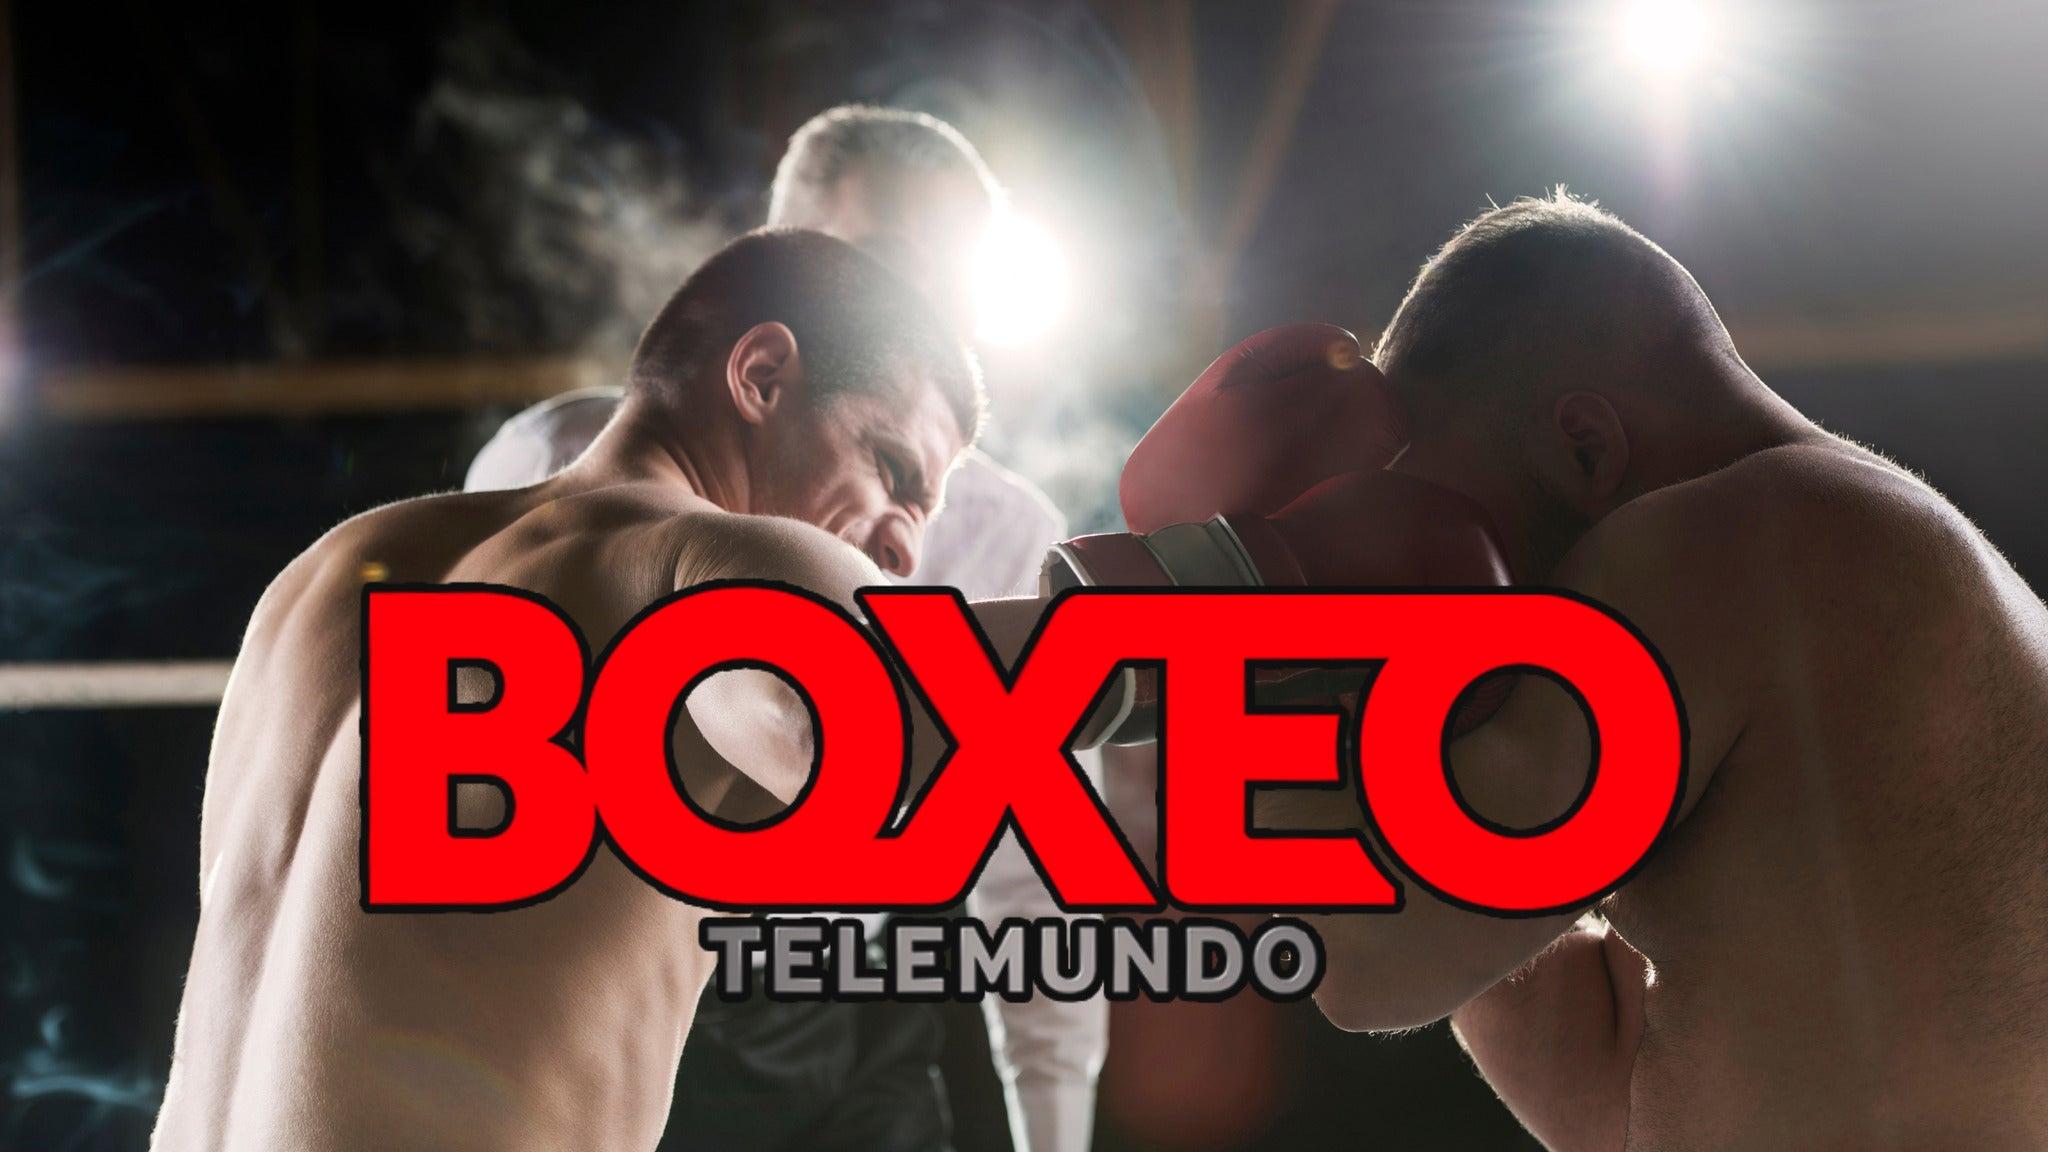 Boxeo Telemundo Championship Boxing